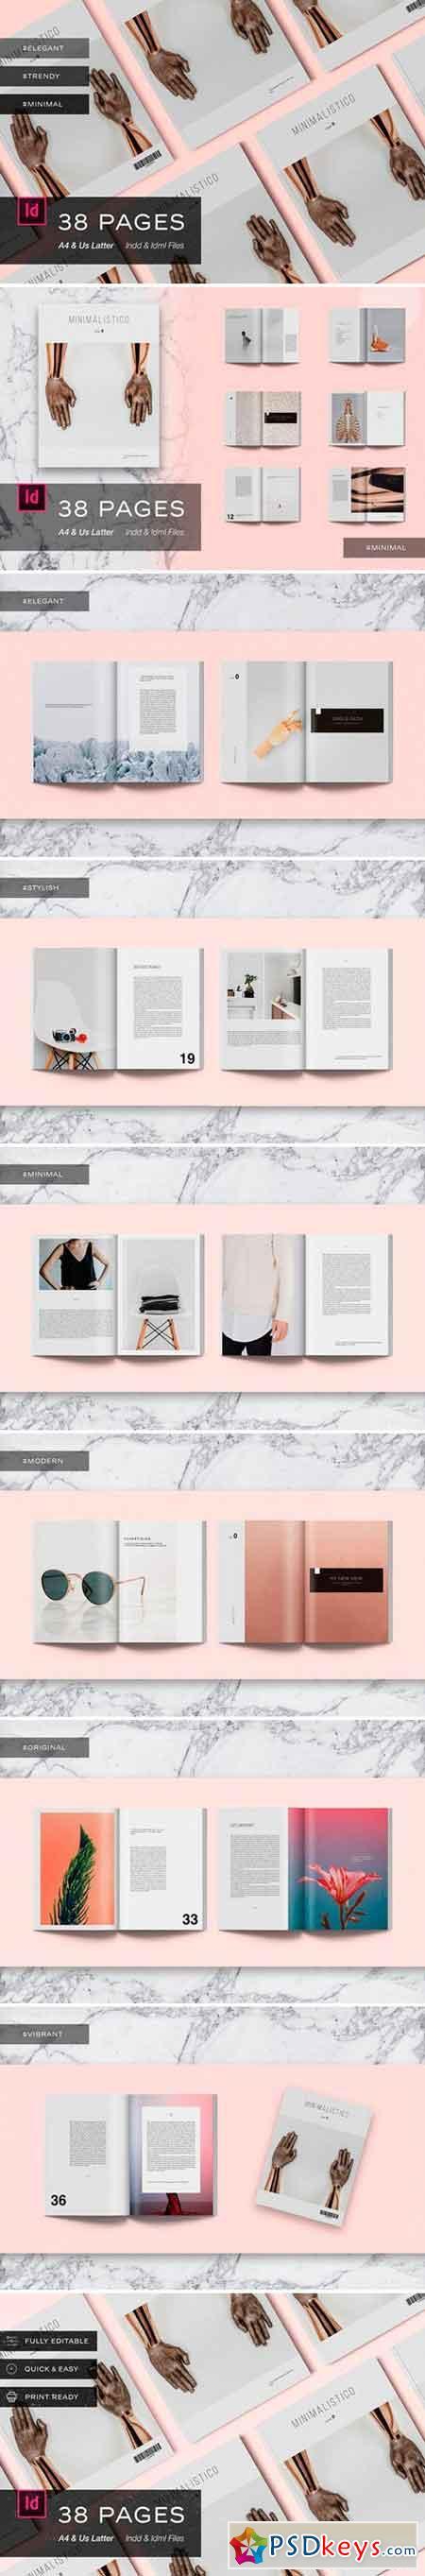 Magazine Template - Minimalistico 2487255